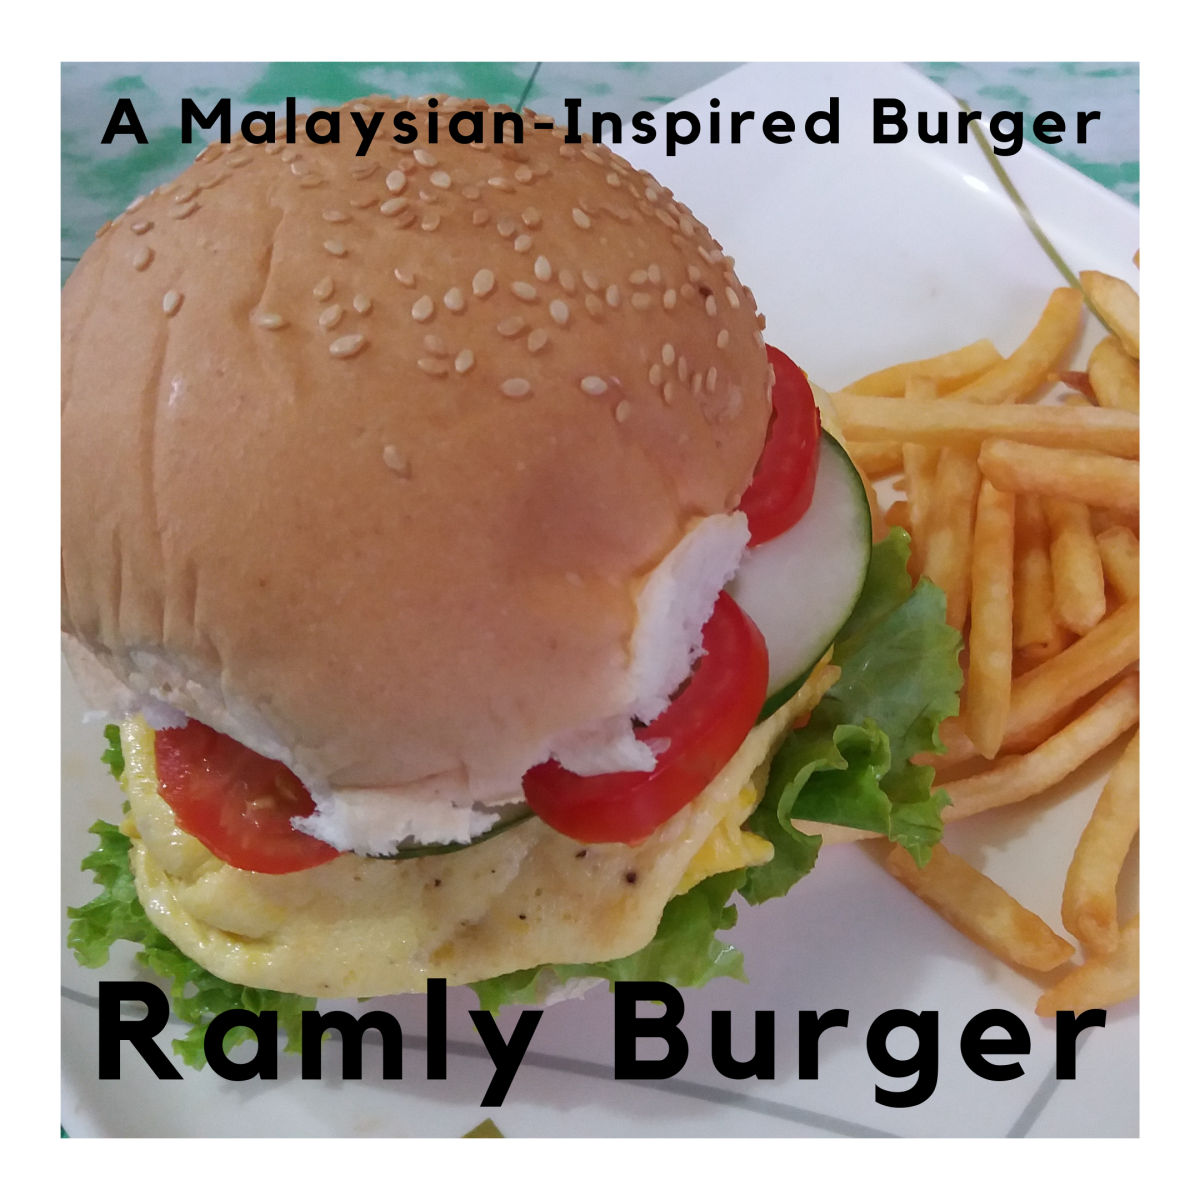 How to Cook Ramly Burger: A Malaysian-Inspired Burger